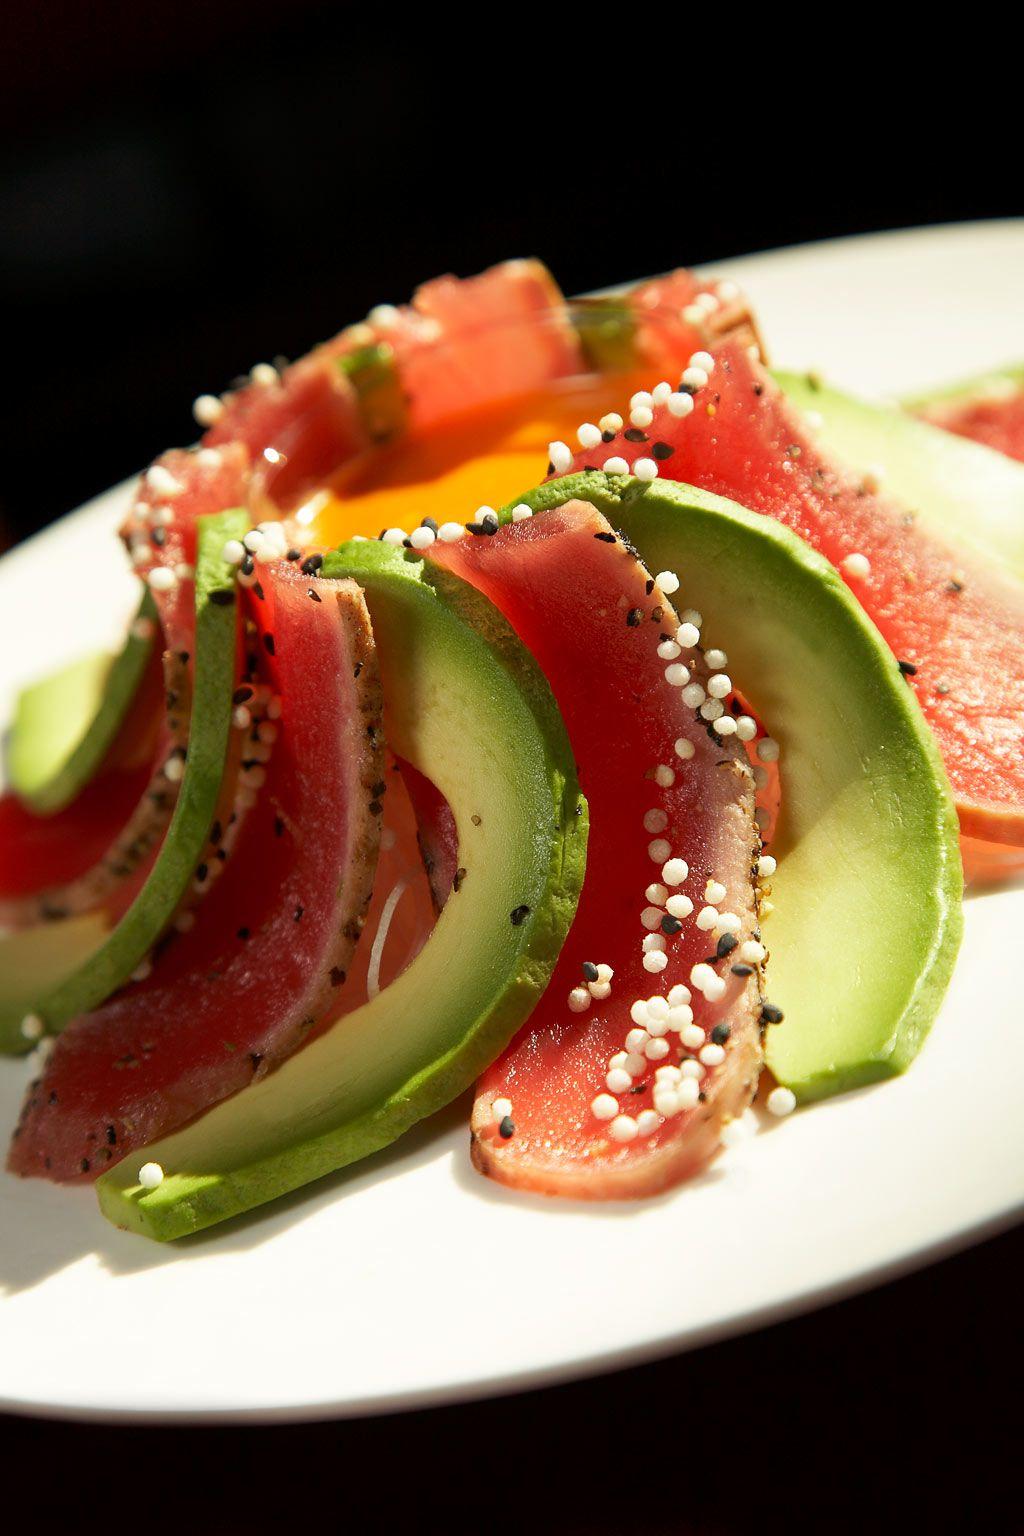 welovesushi | Food ¡jum! | Pinterest